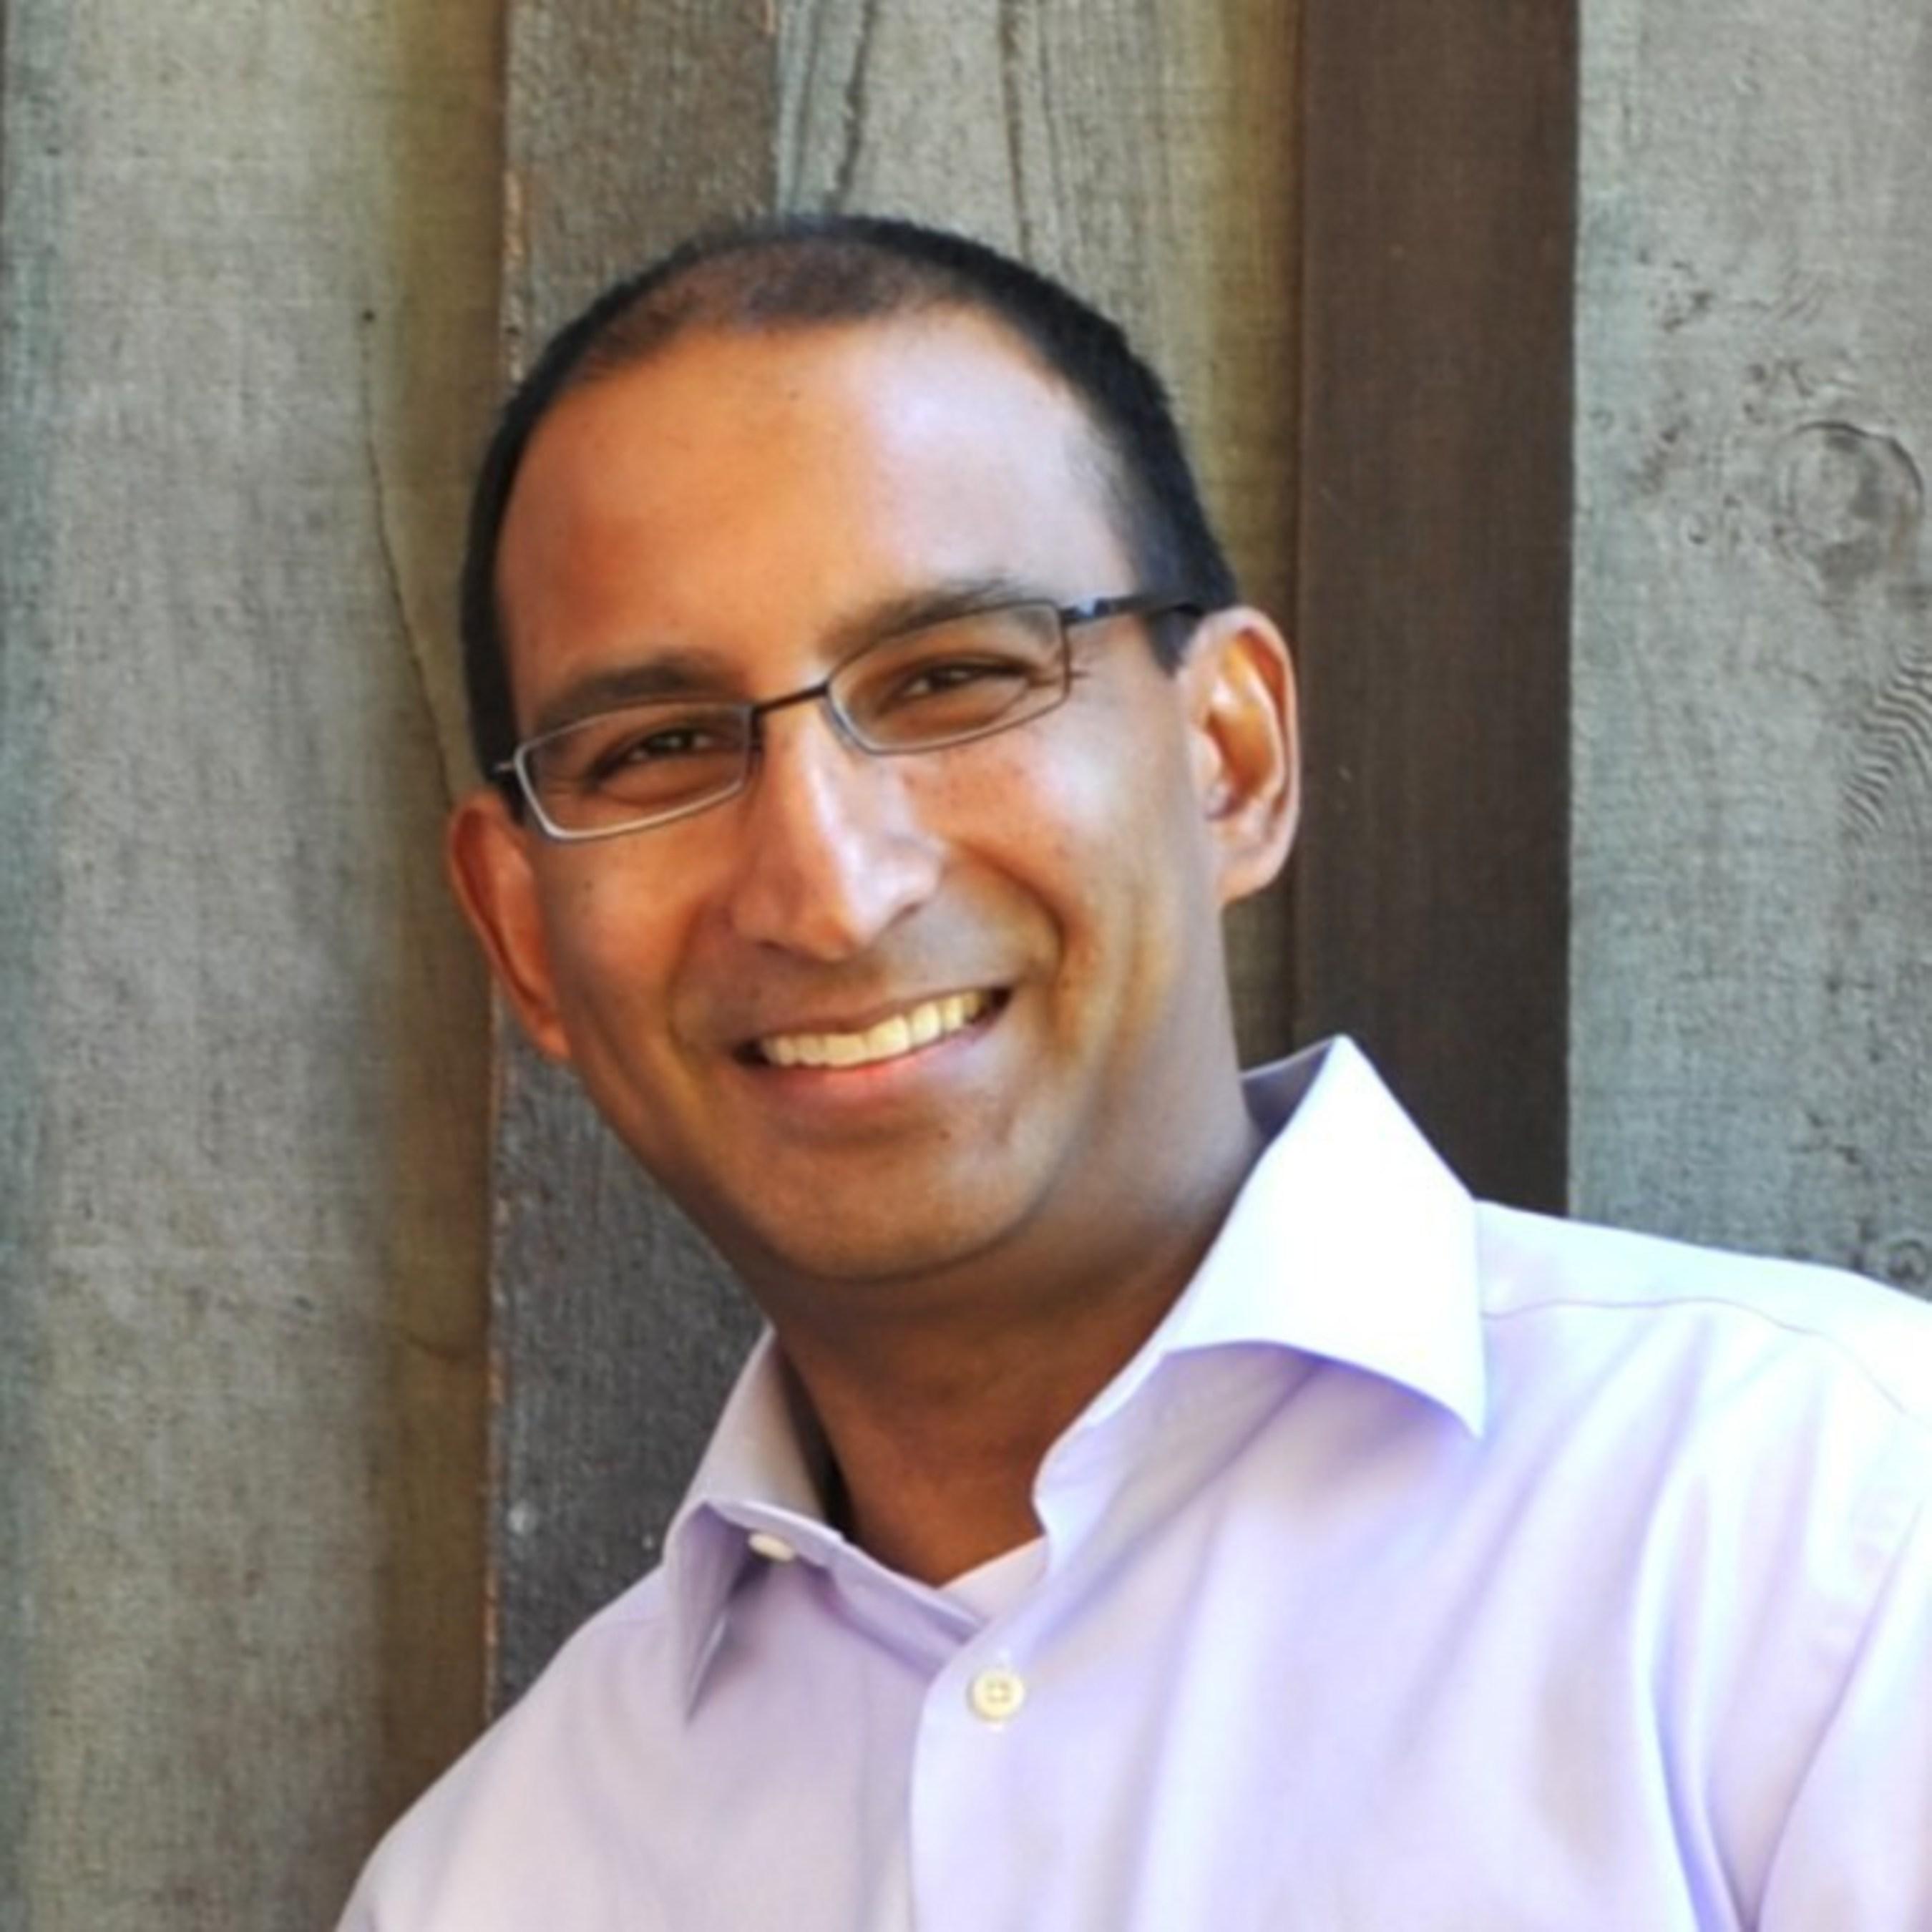 SendGrid appoints Sameer Dholakia as new CEO to lead next phase of company growth. (PRNewsFoto/SendGrid)